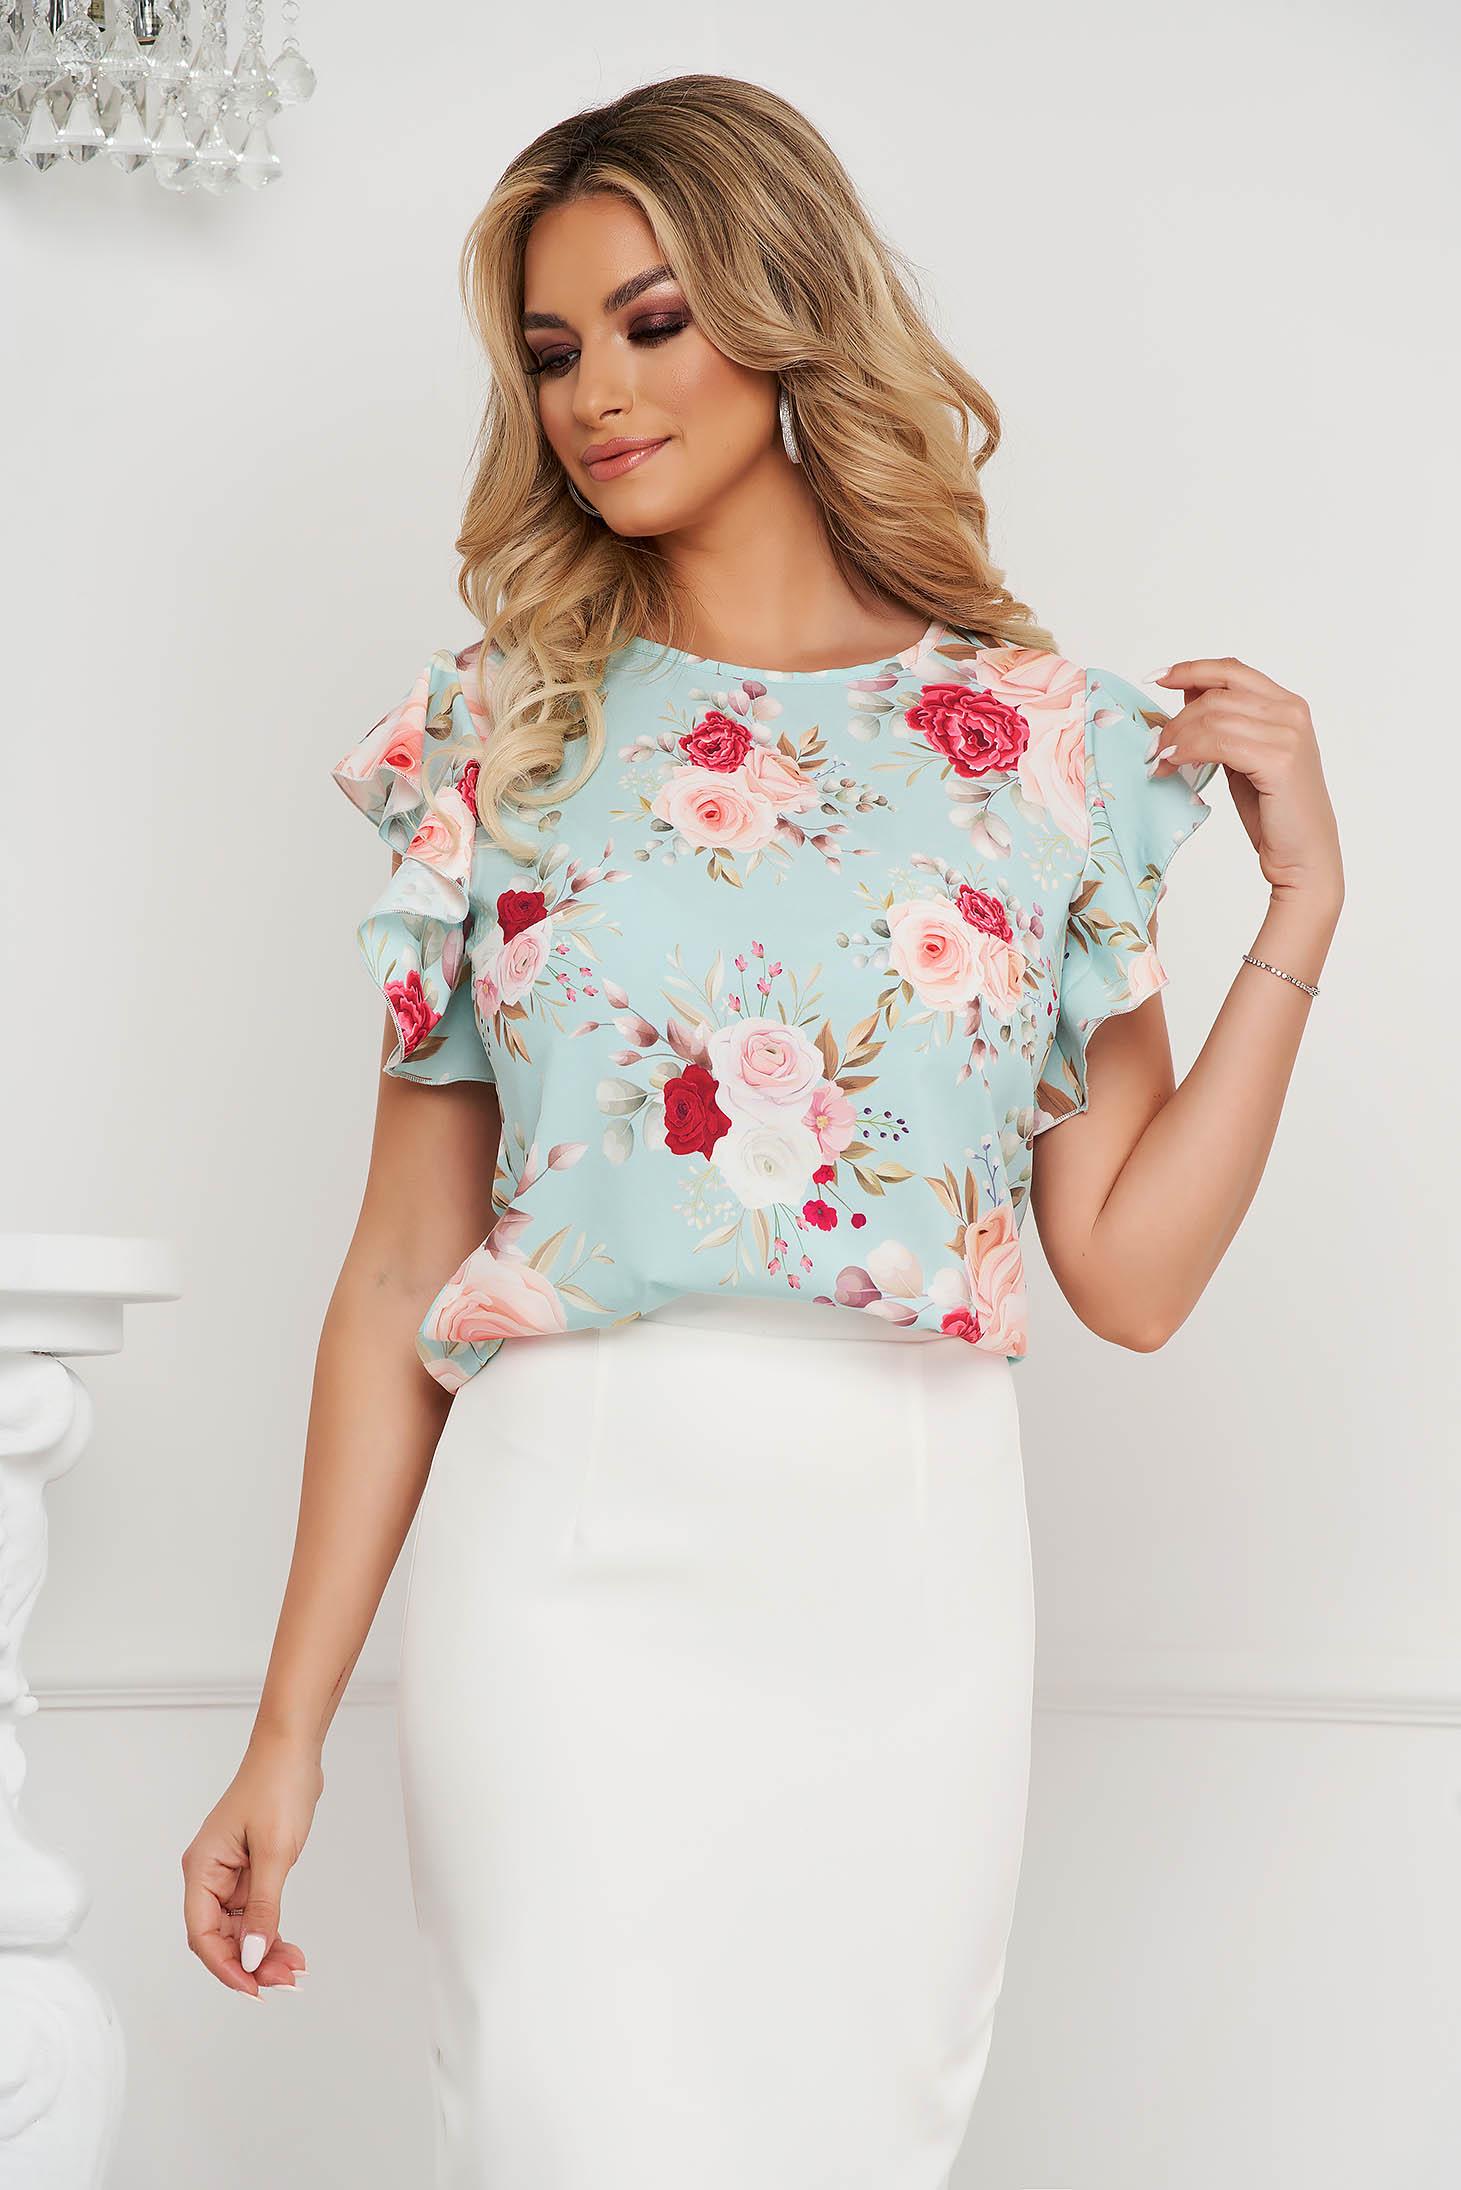 Bluza dama StarShinerS office din material fin la atingere cu croi larg cu volanase si imprimeu floral unic